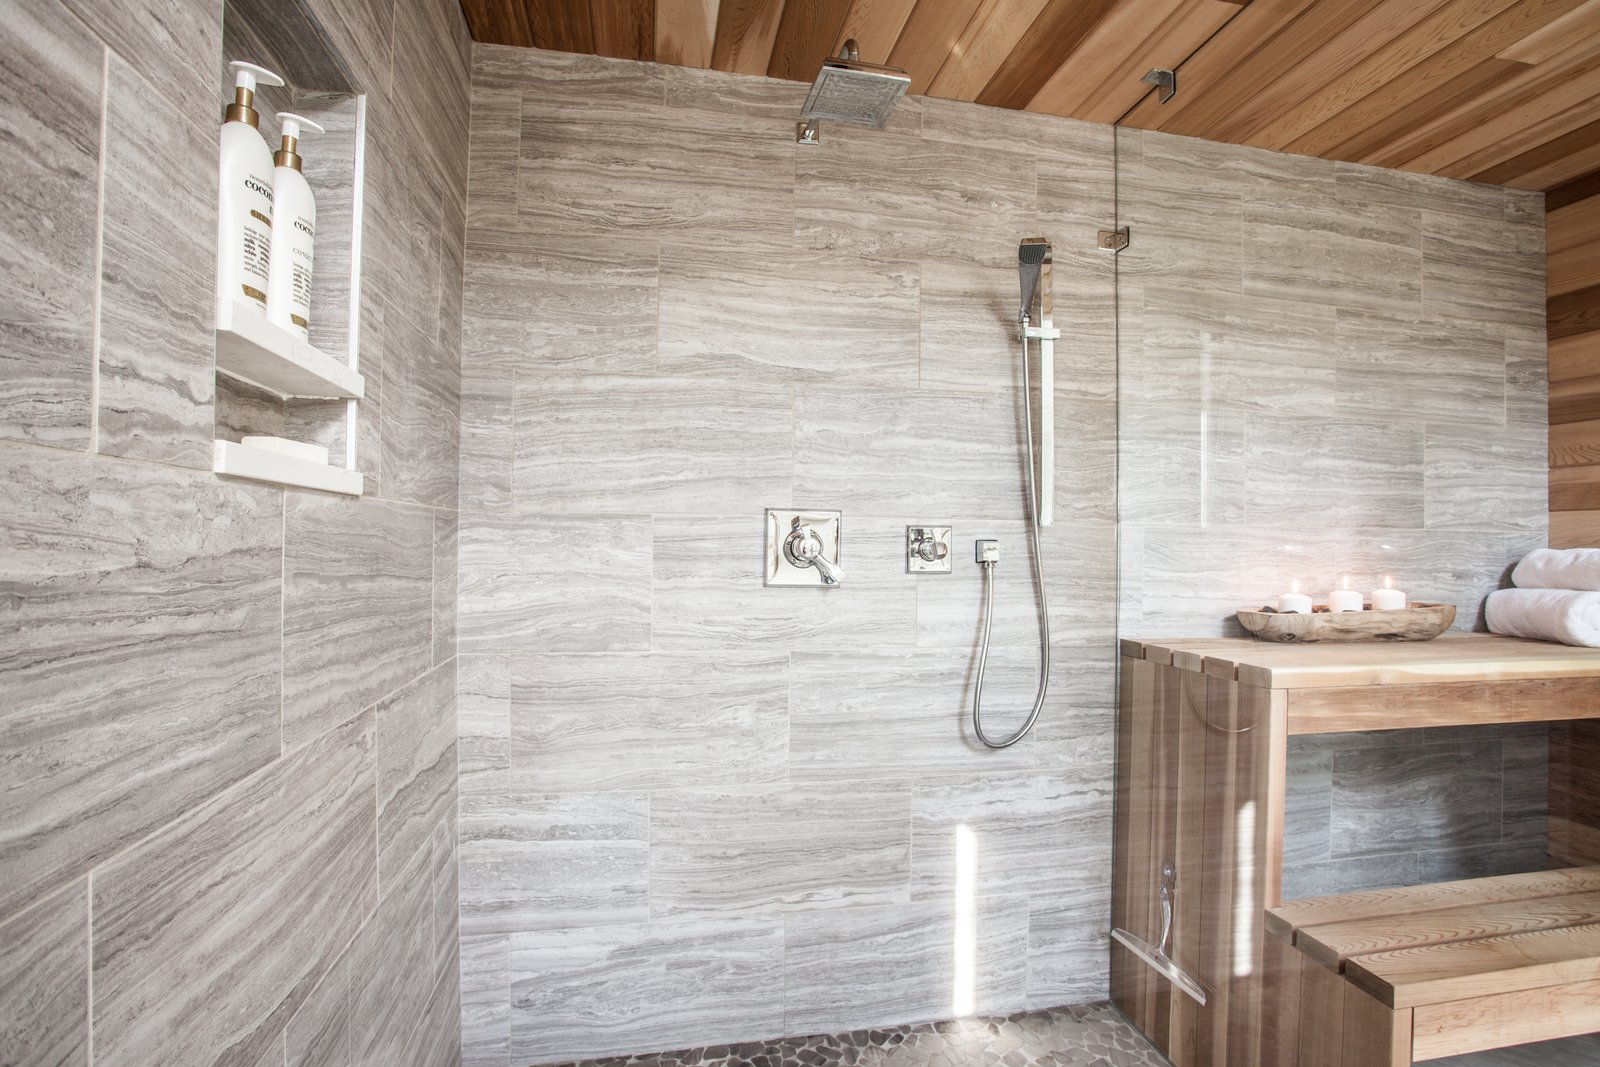 Bath Room, Freestanding Tub, Wall Mount Sink, and Open Shower  Ramsey Bathroom Remodel